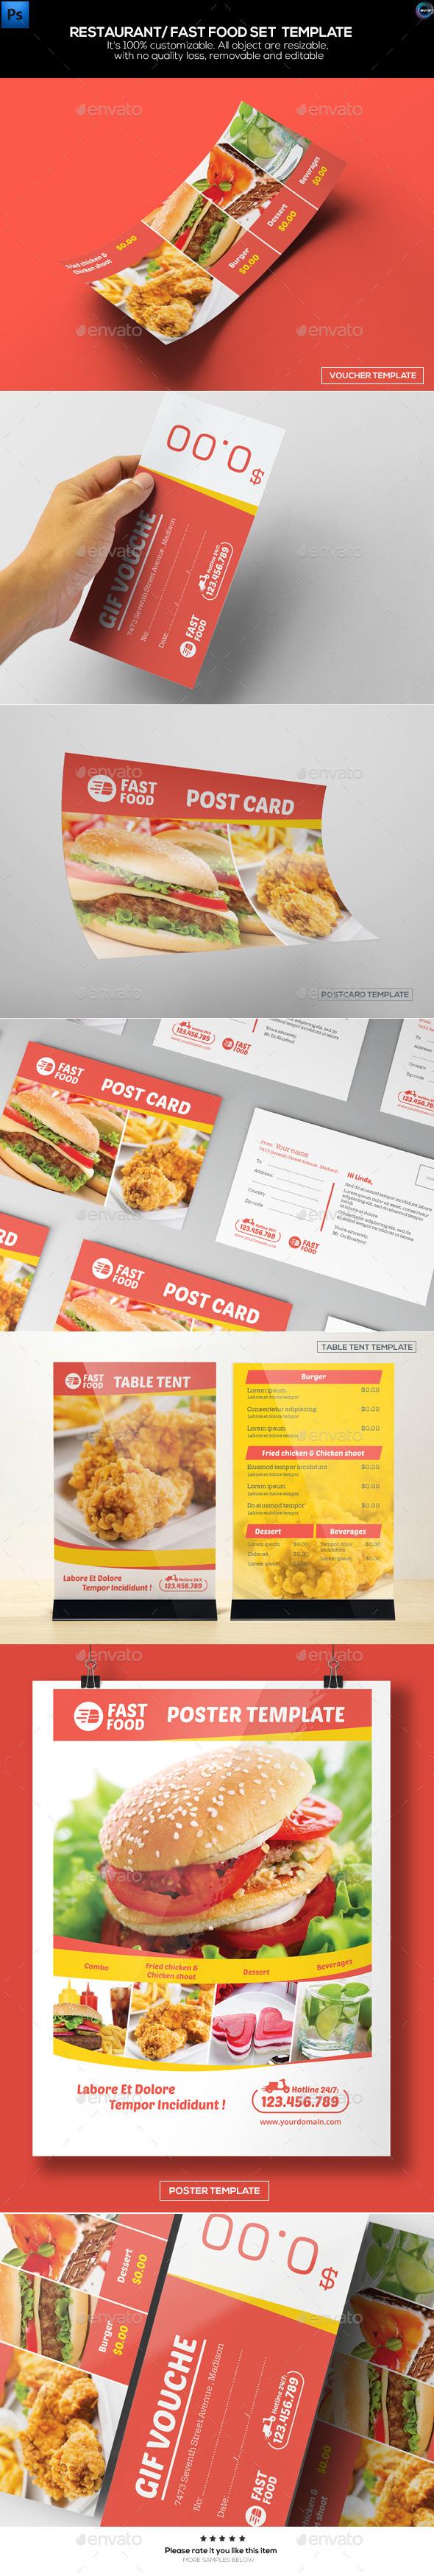 Restaurant/ Fast Food Set Templates - Food Menus Print Templates